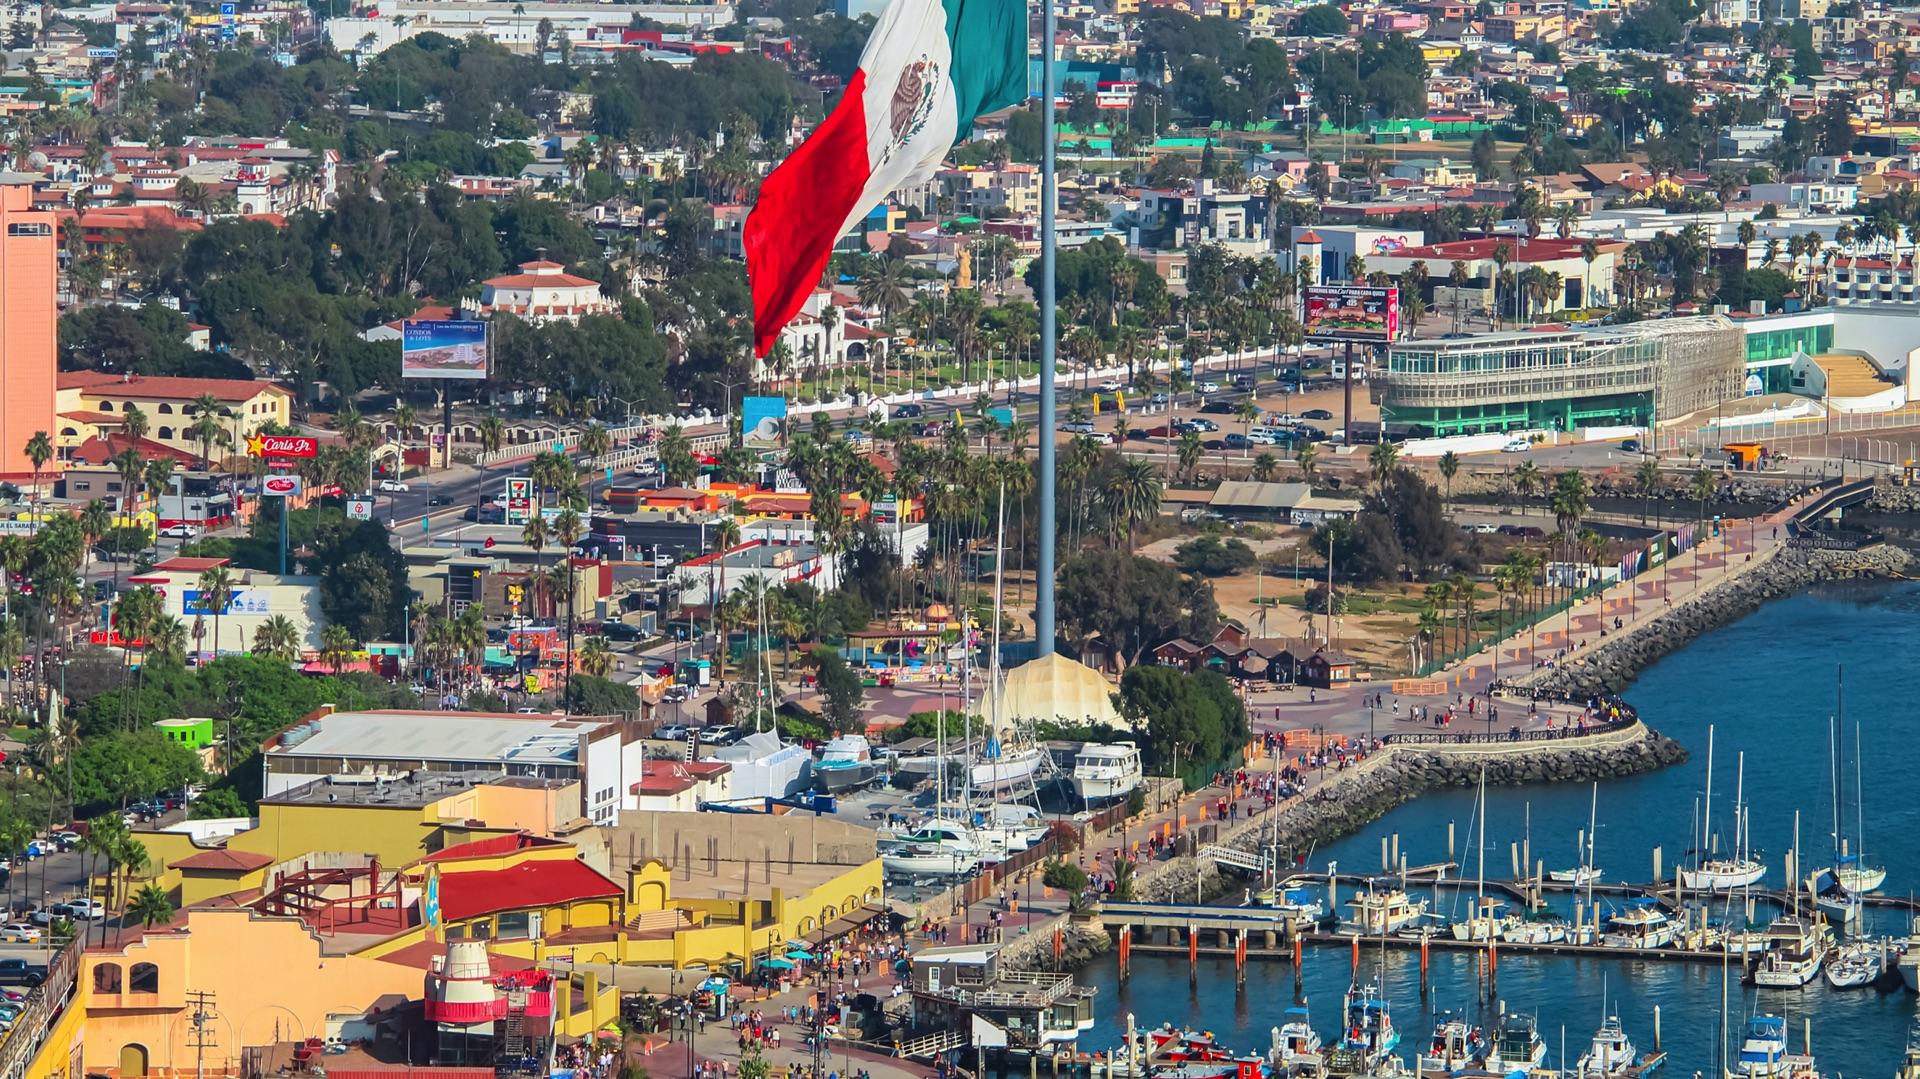 Que hacer en un fin de semana en Ensenada Resized